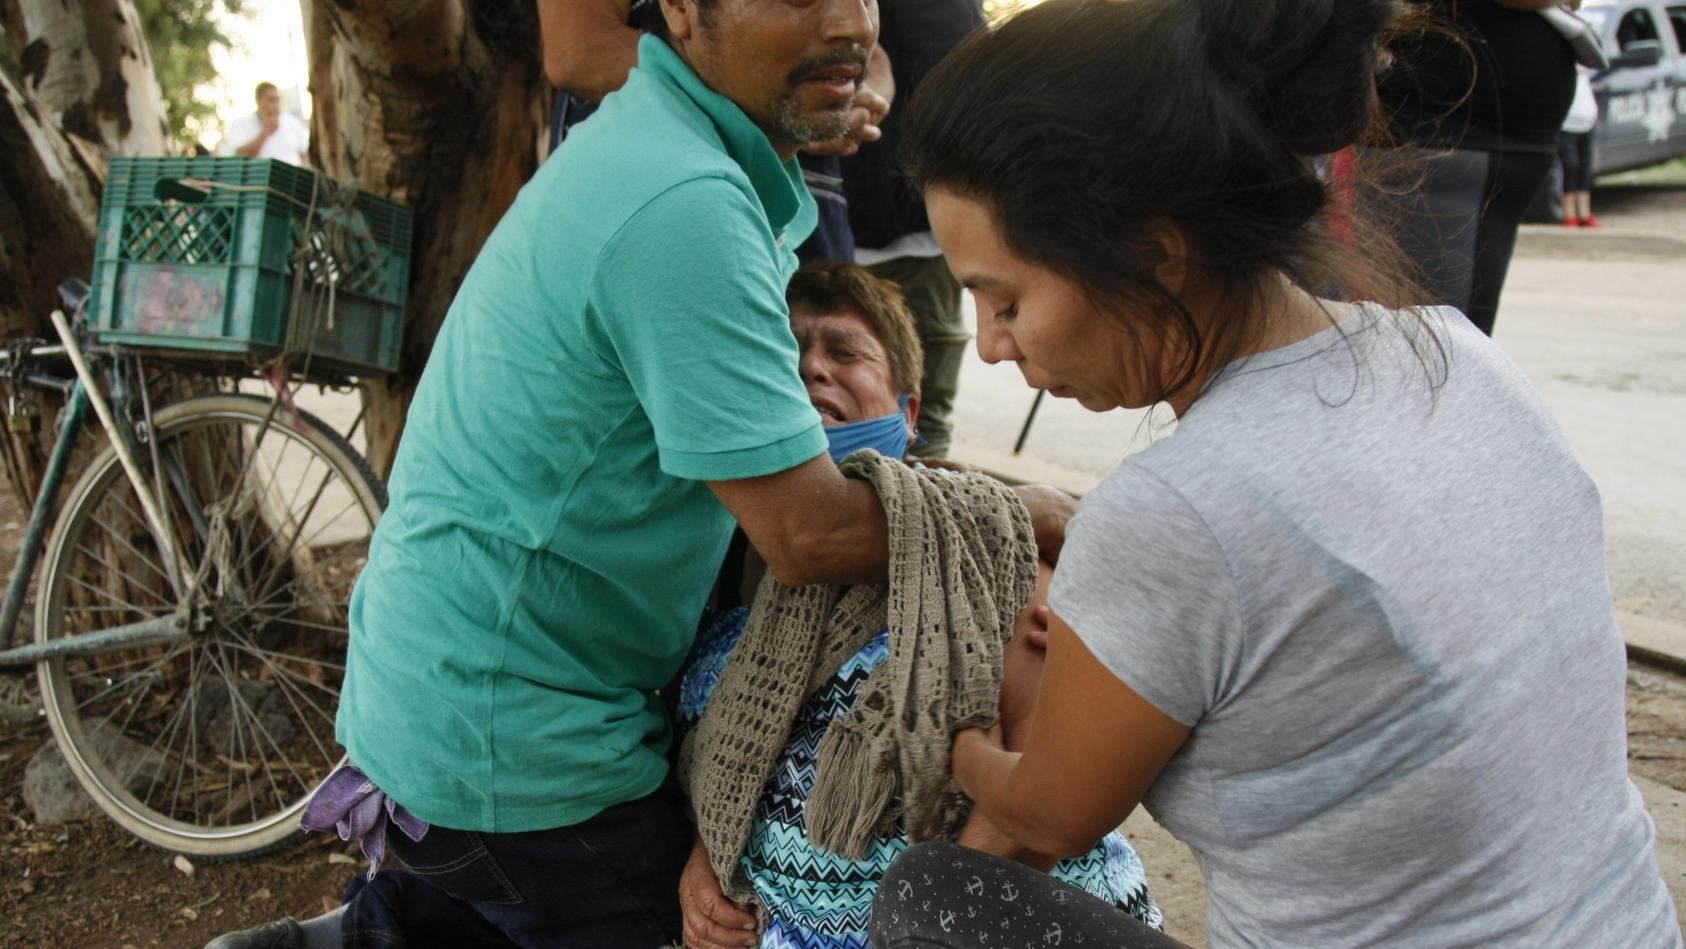 Massaker in Mexiko